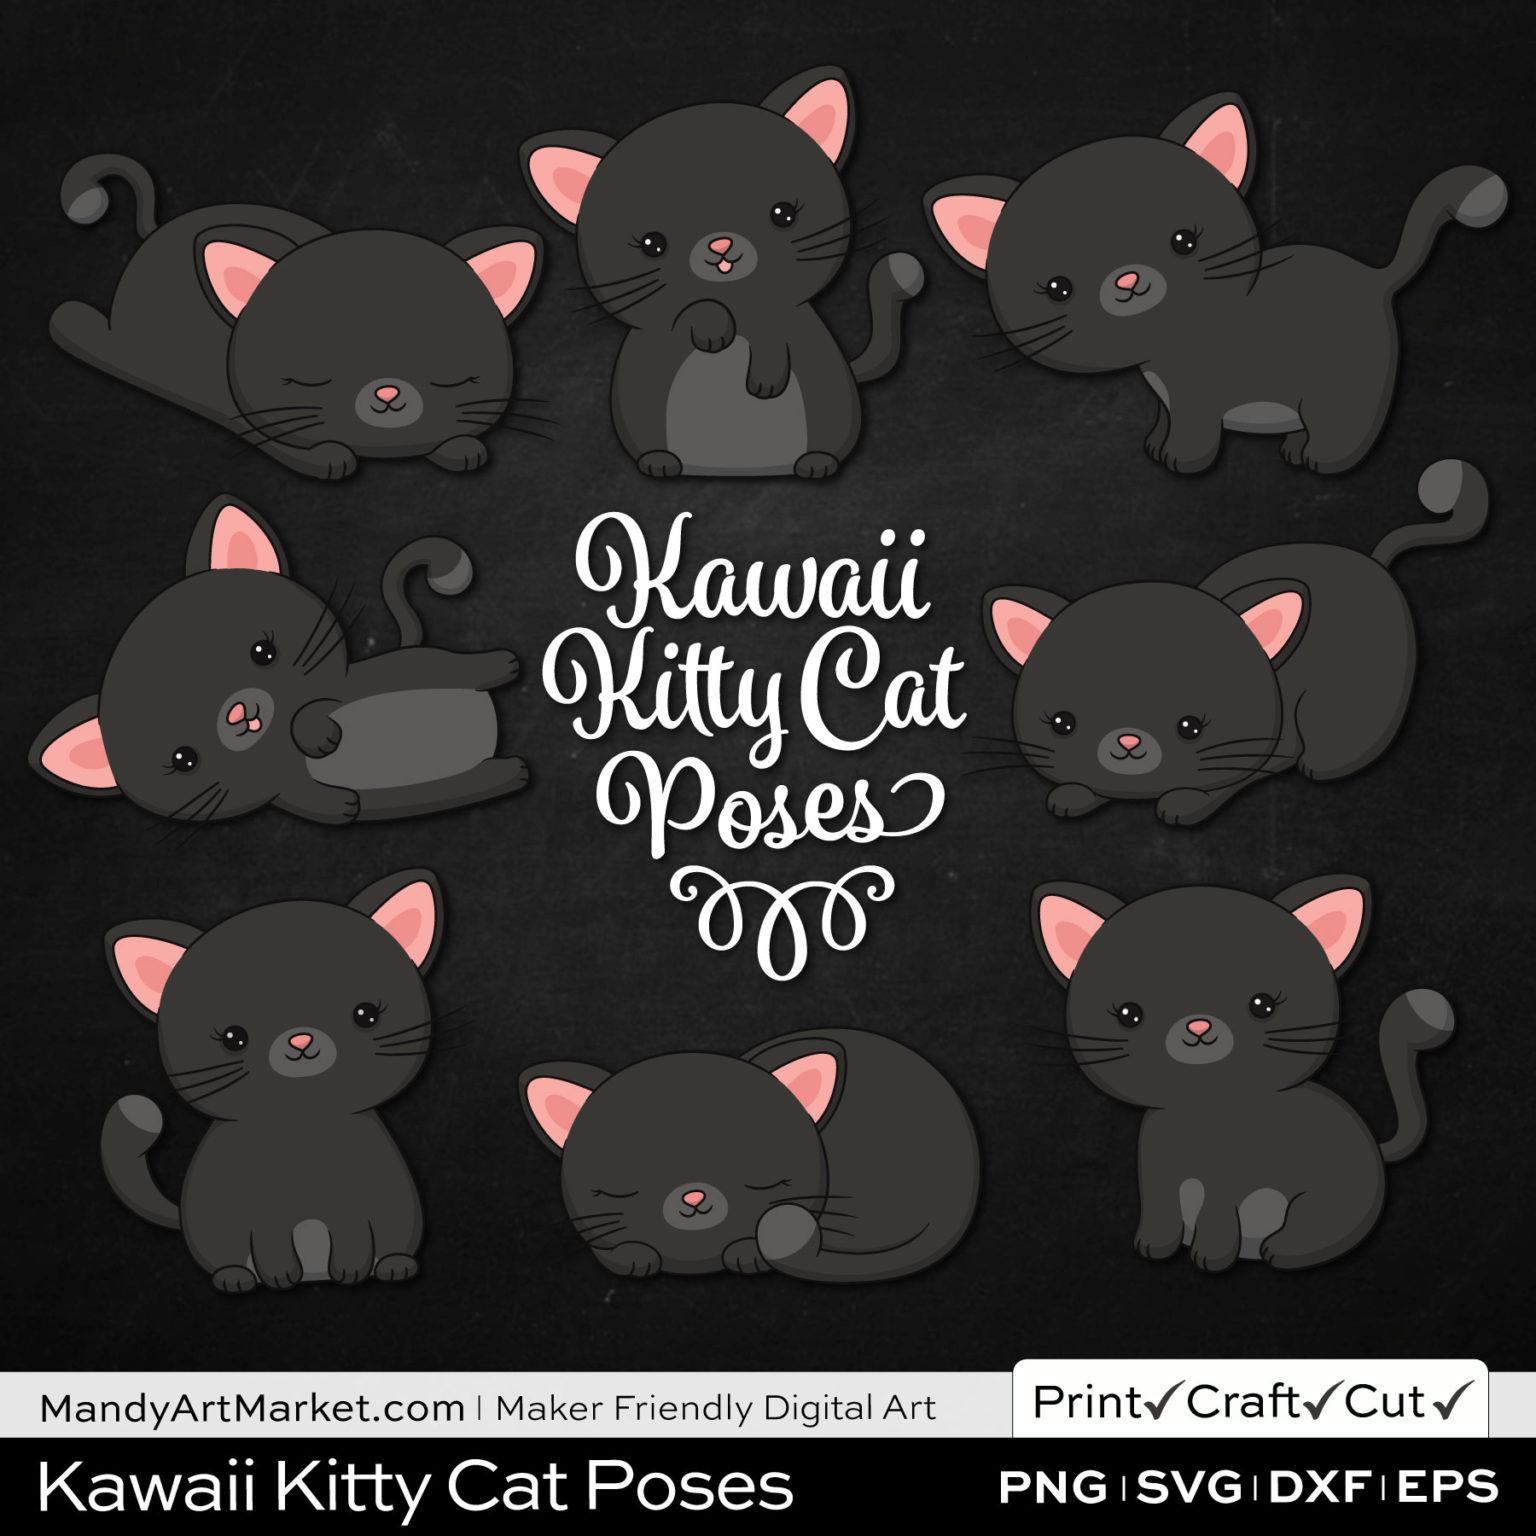 Midnight Gray Kawaii Kitty Cat Poses Clipart on Black Background